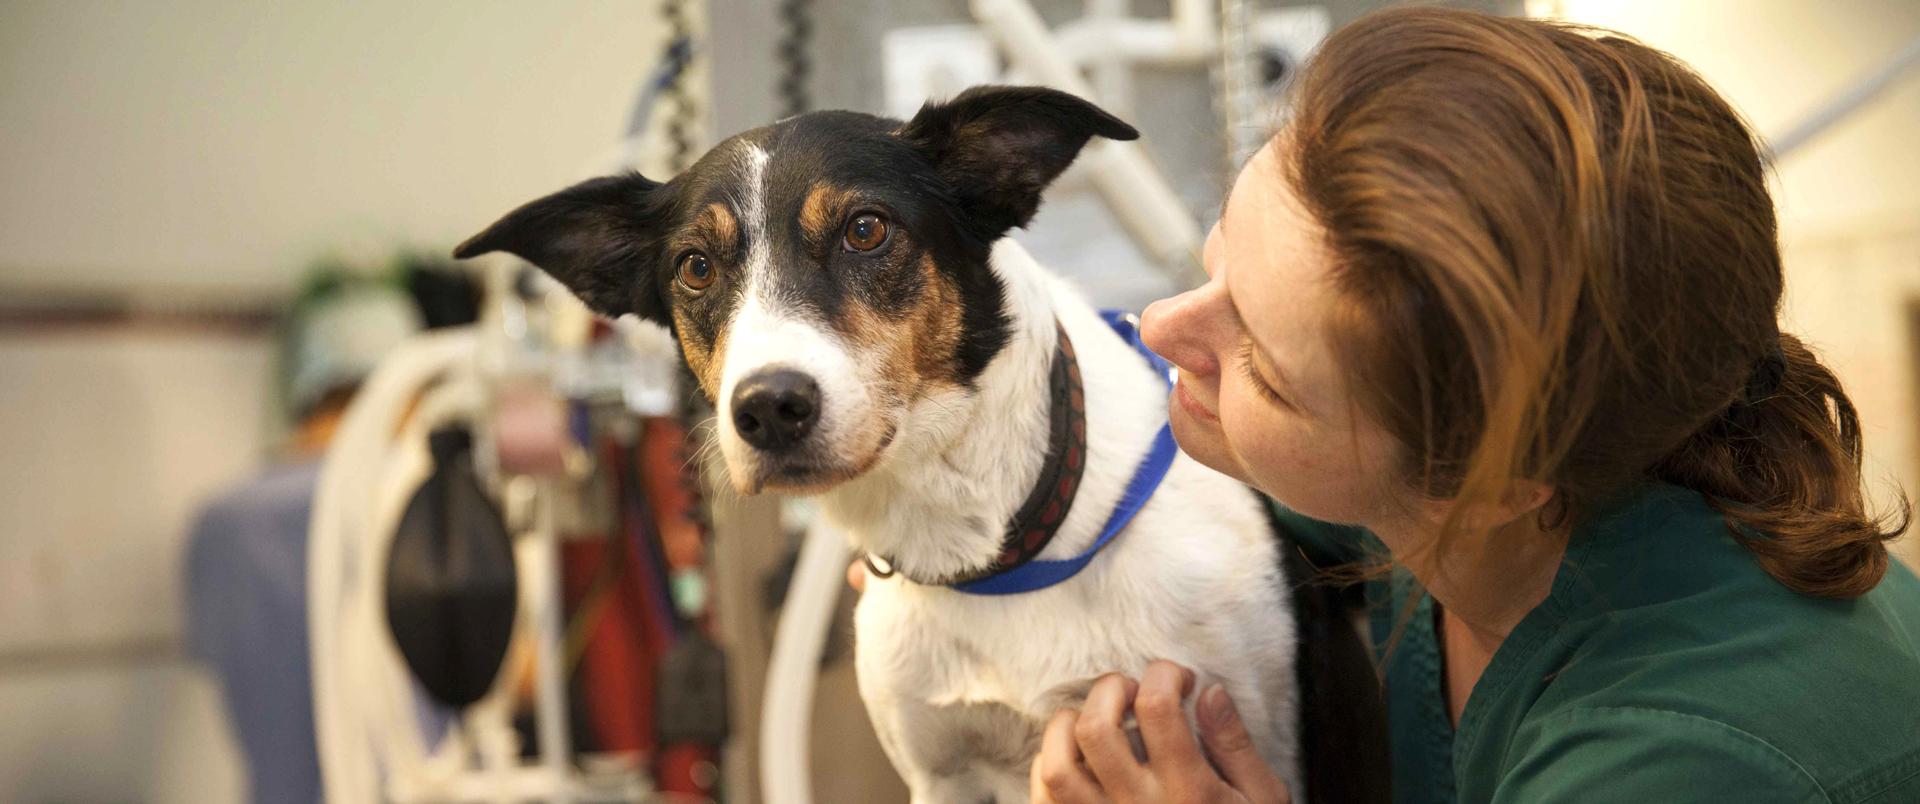 Veterinary surgeon with dog